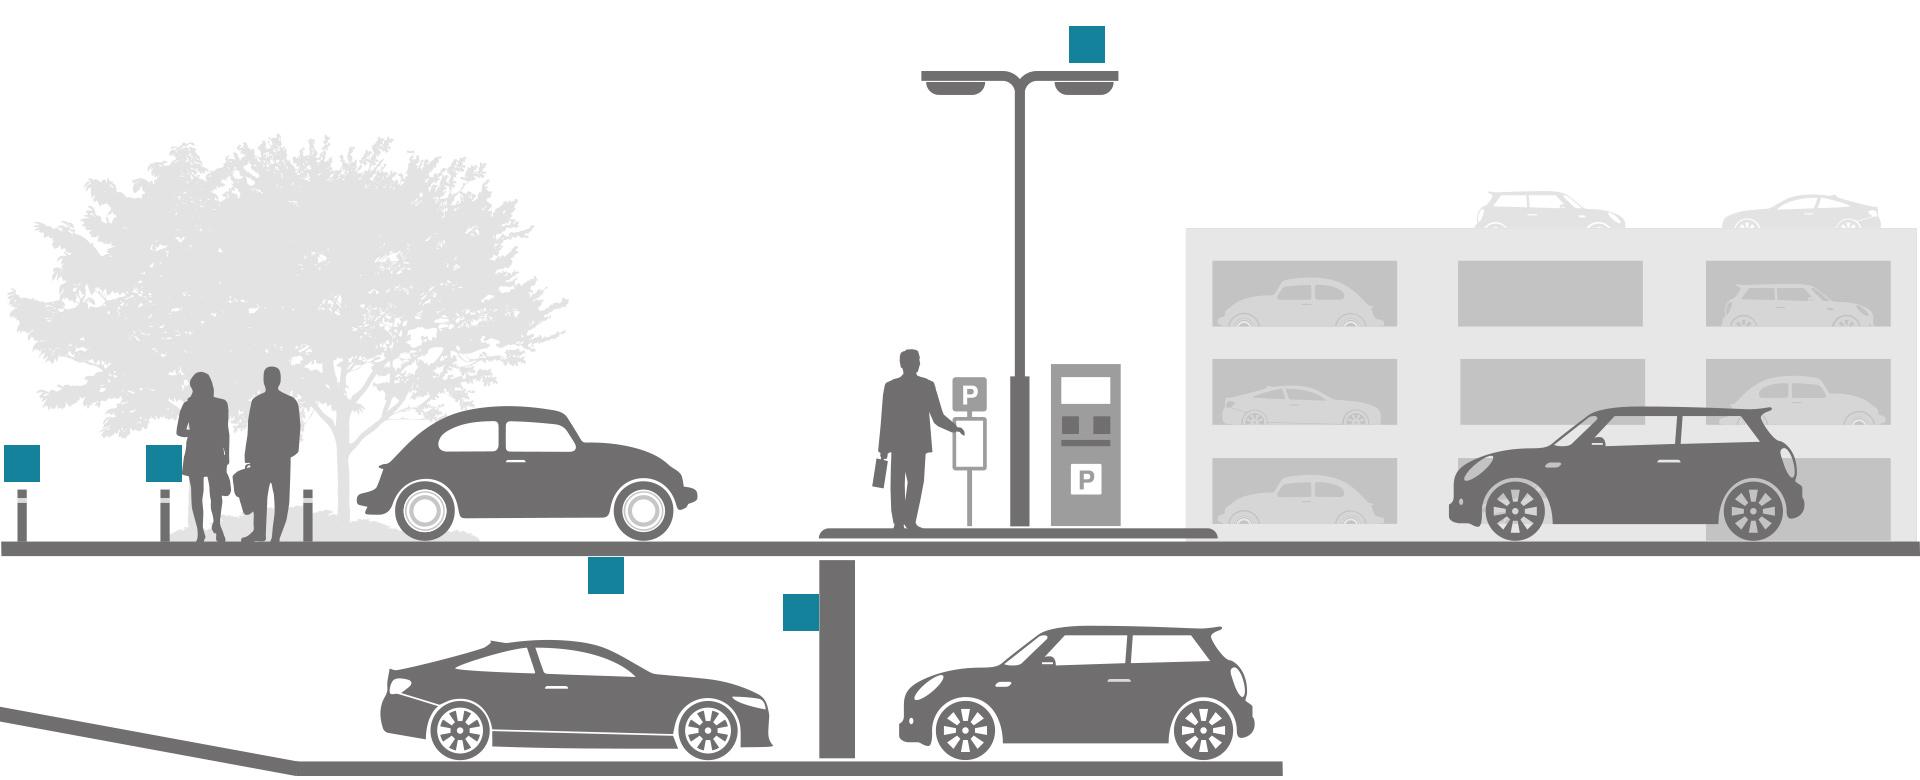 Transportapplications_car_park